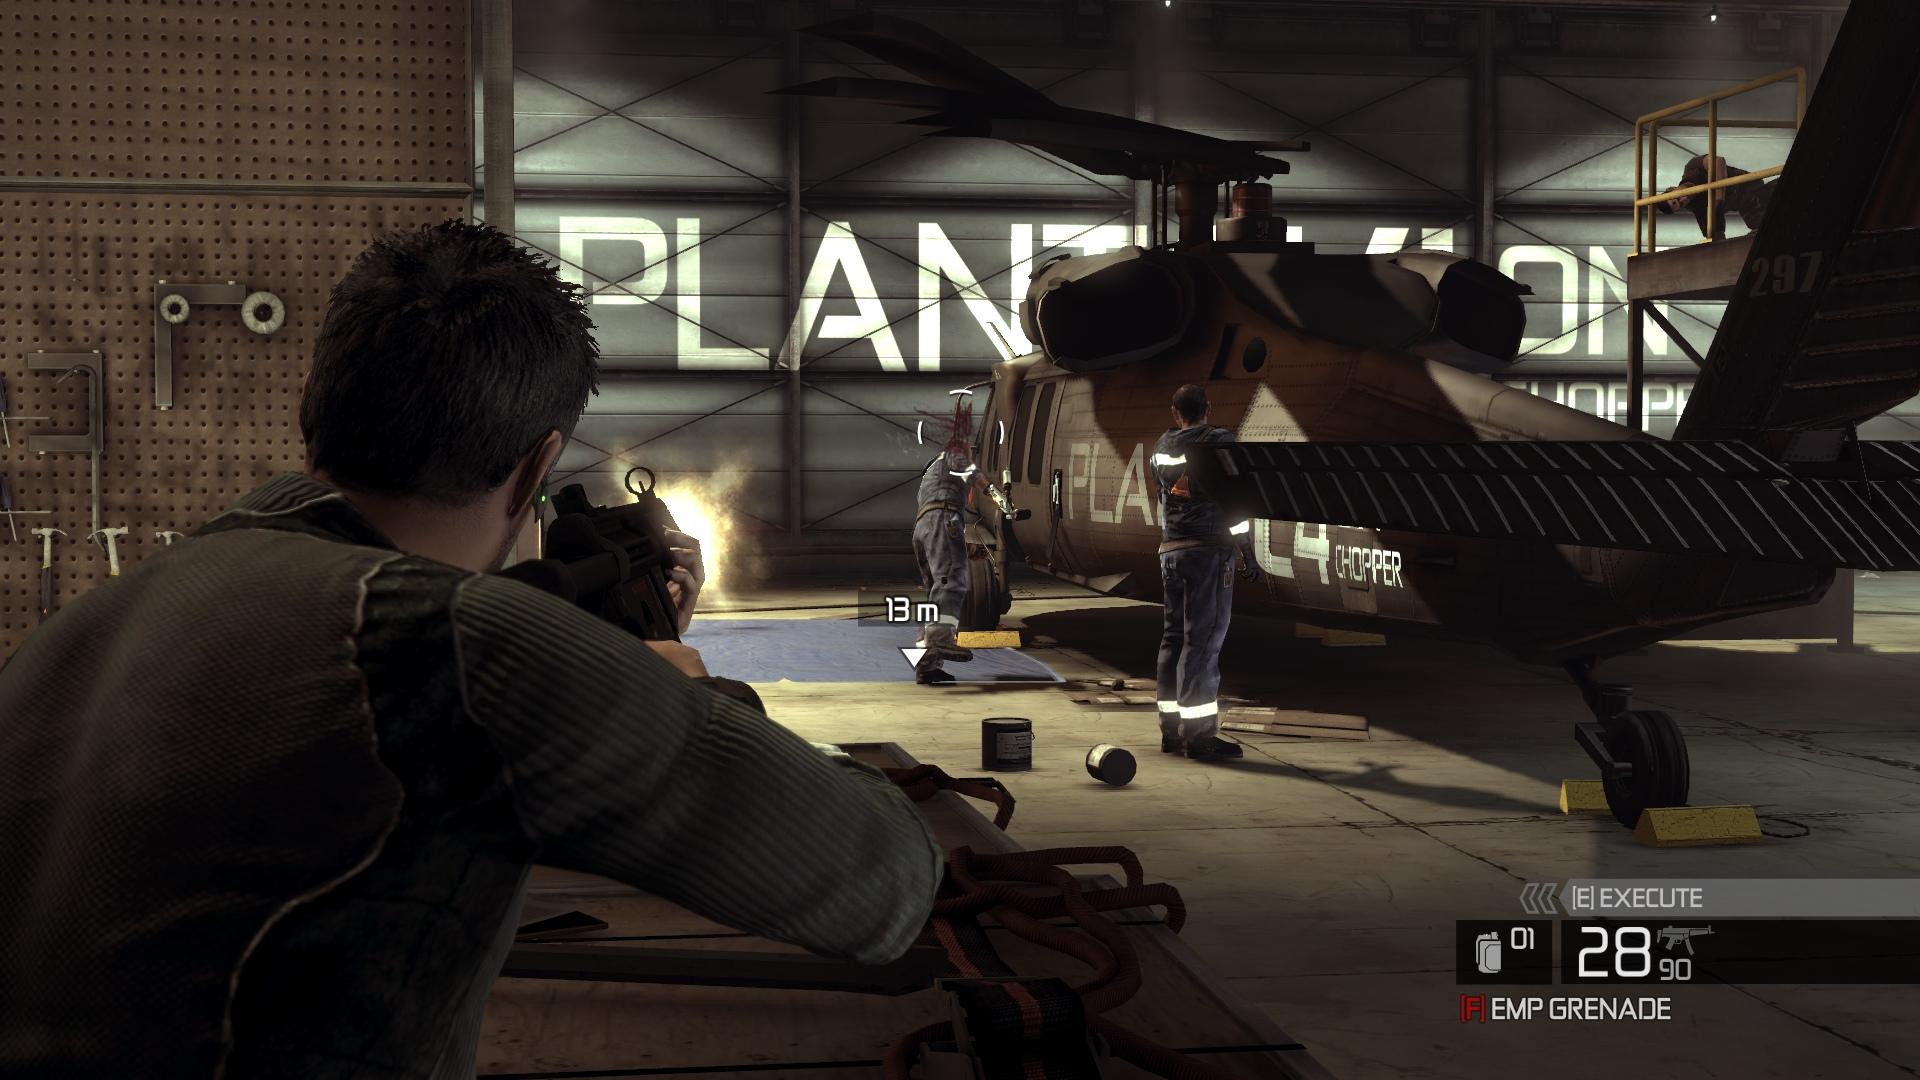 Tom Clancy's Splinter Cell, Conviction, Ubisoft